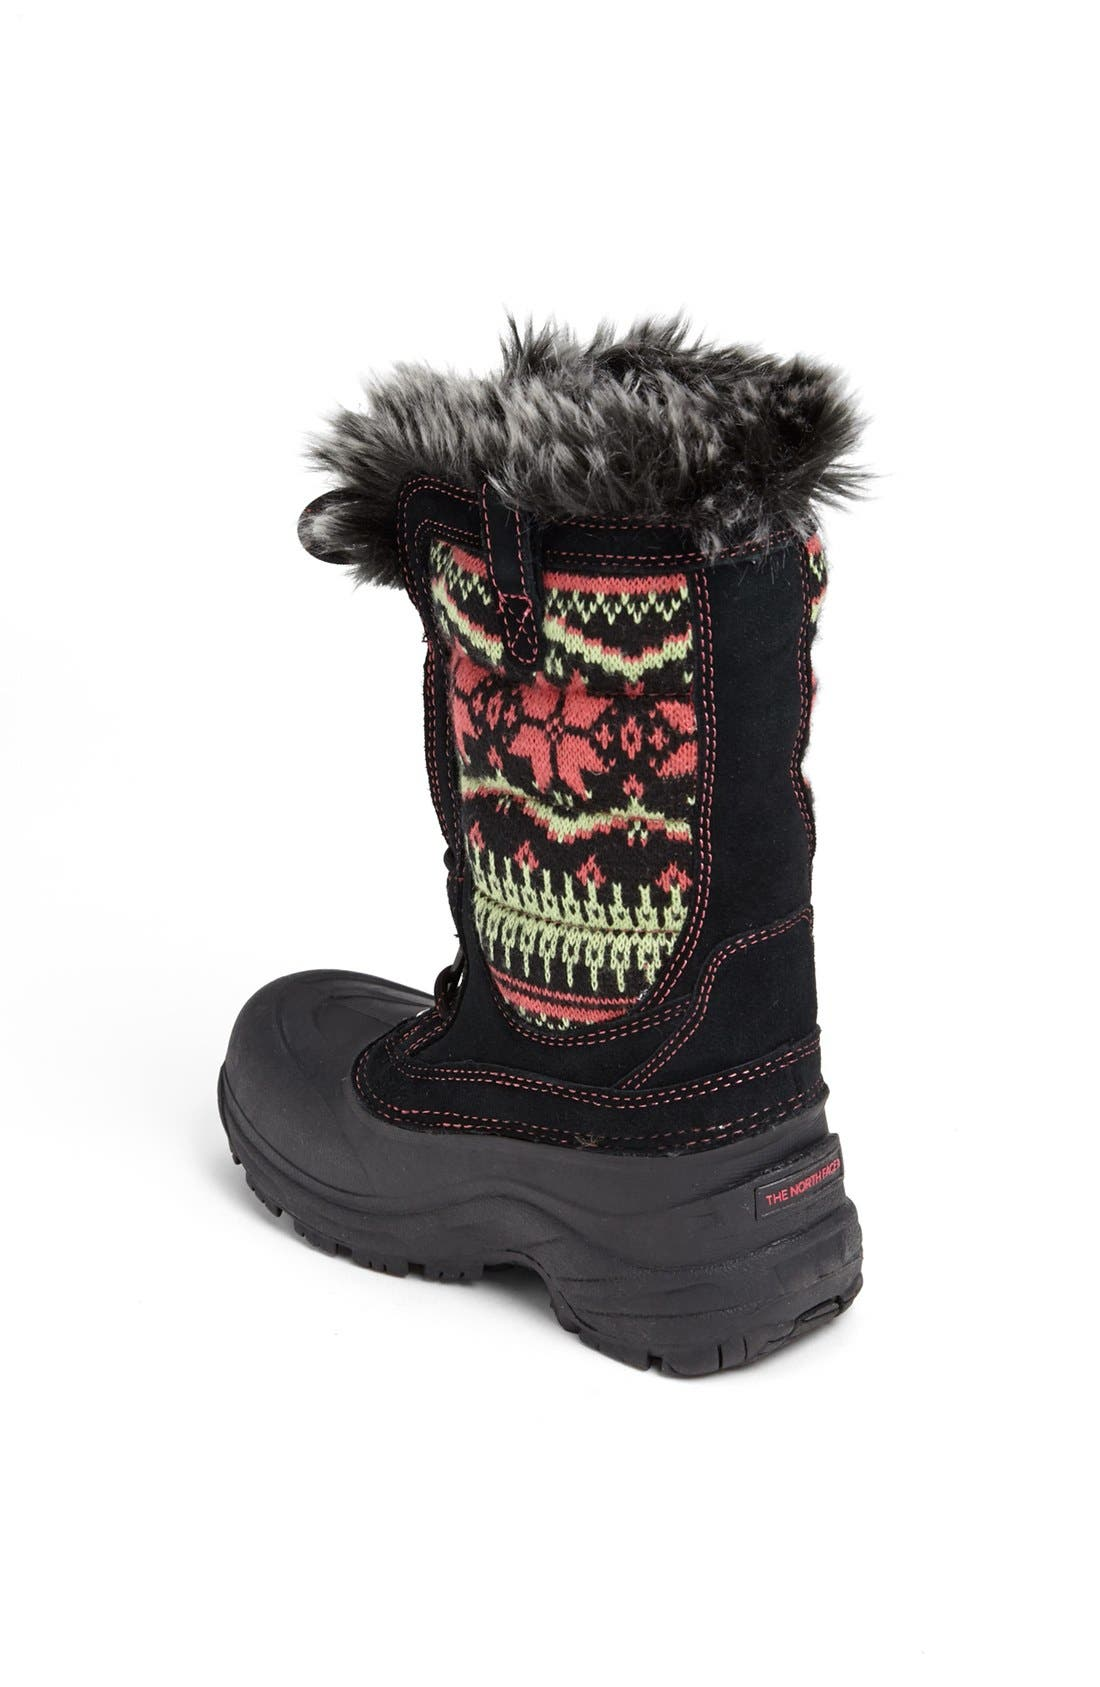 'Shellista' Lace Up Snow Boot,                             Alternate thumbnail 3, color,                             001